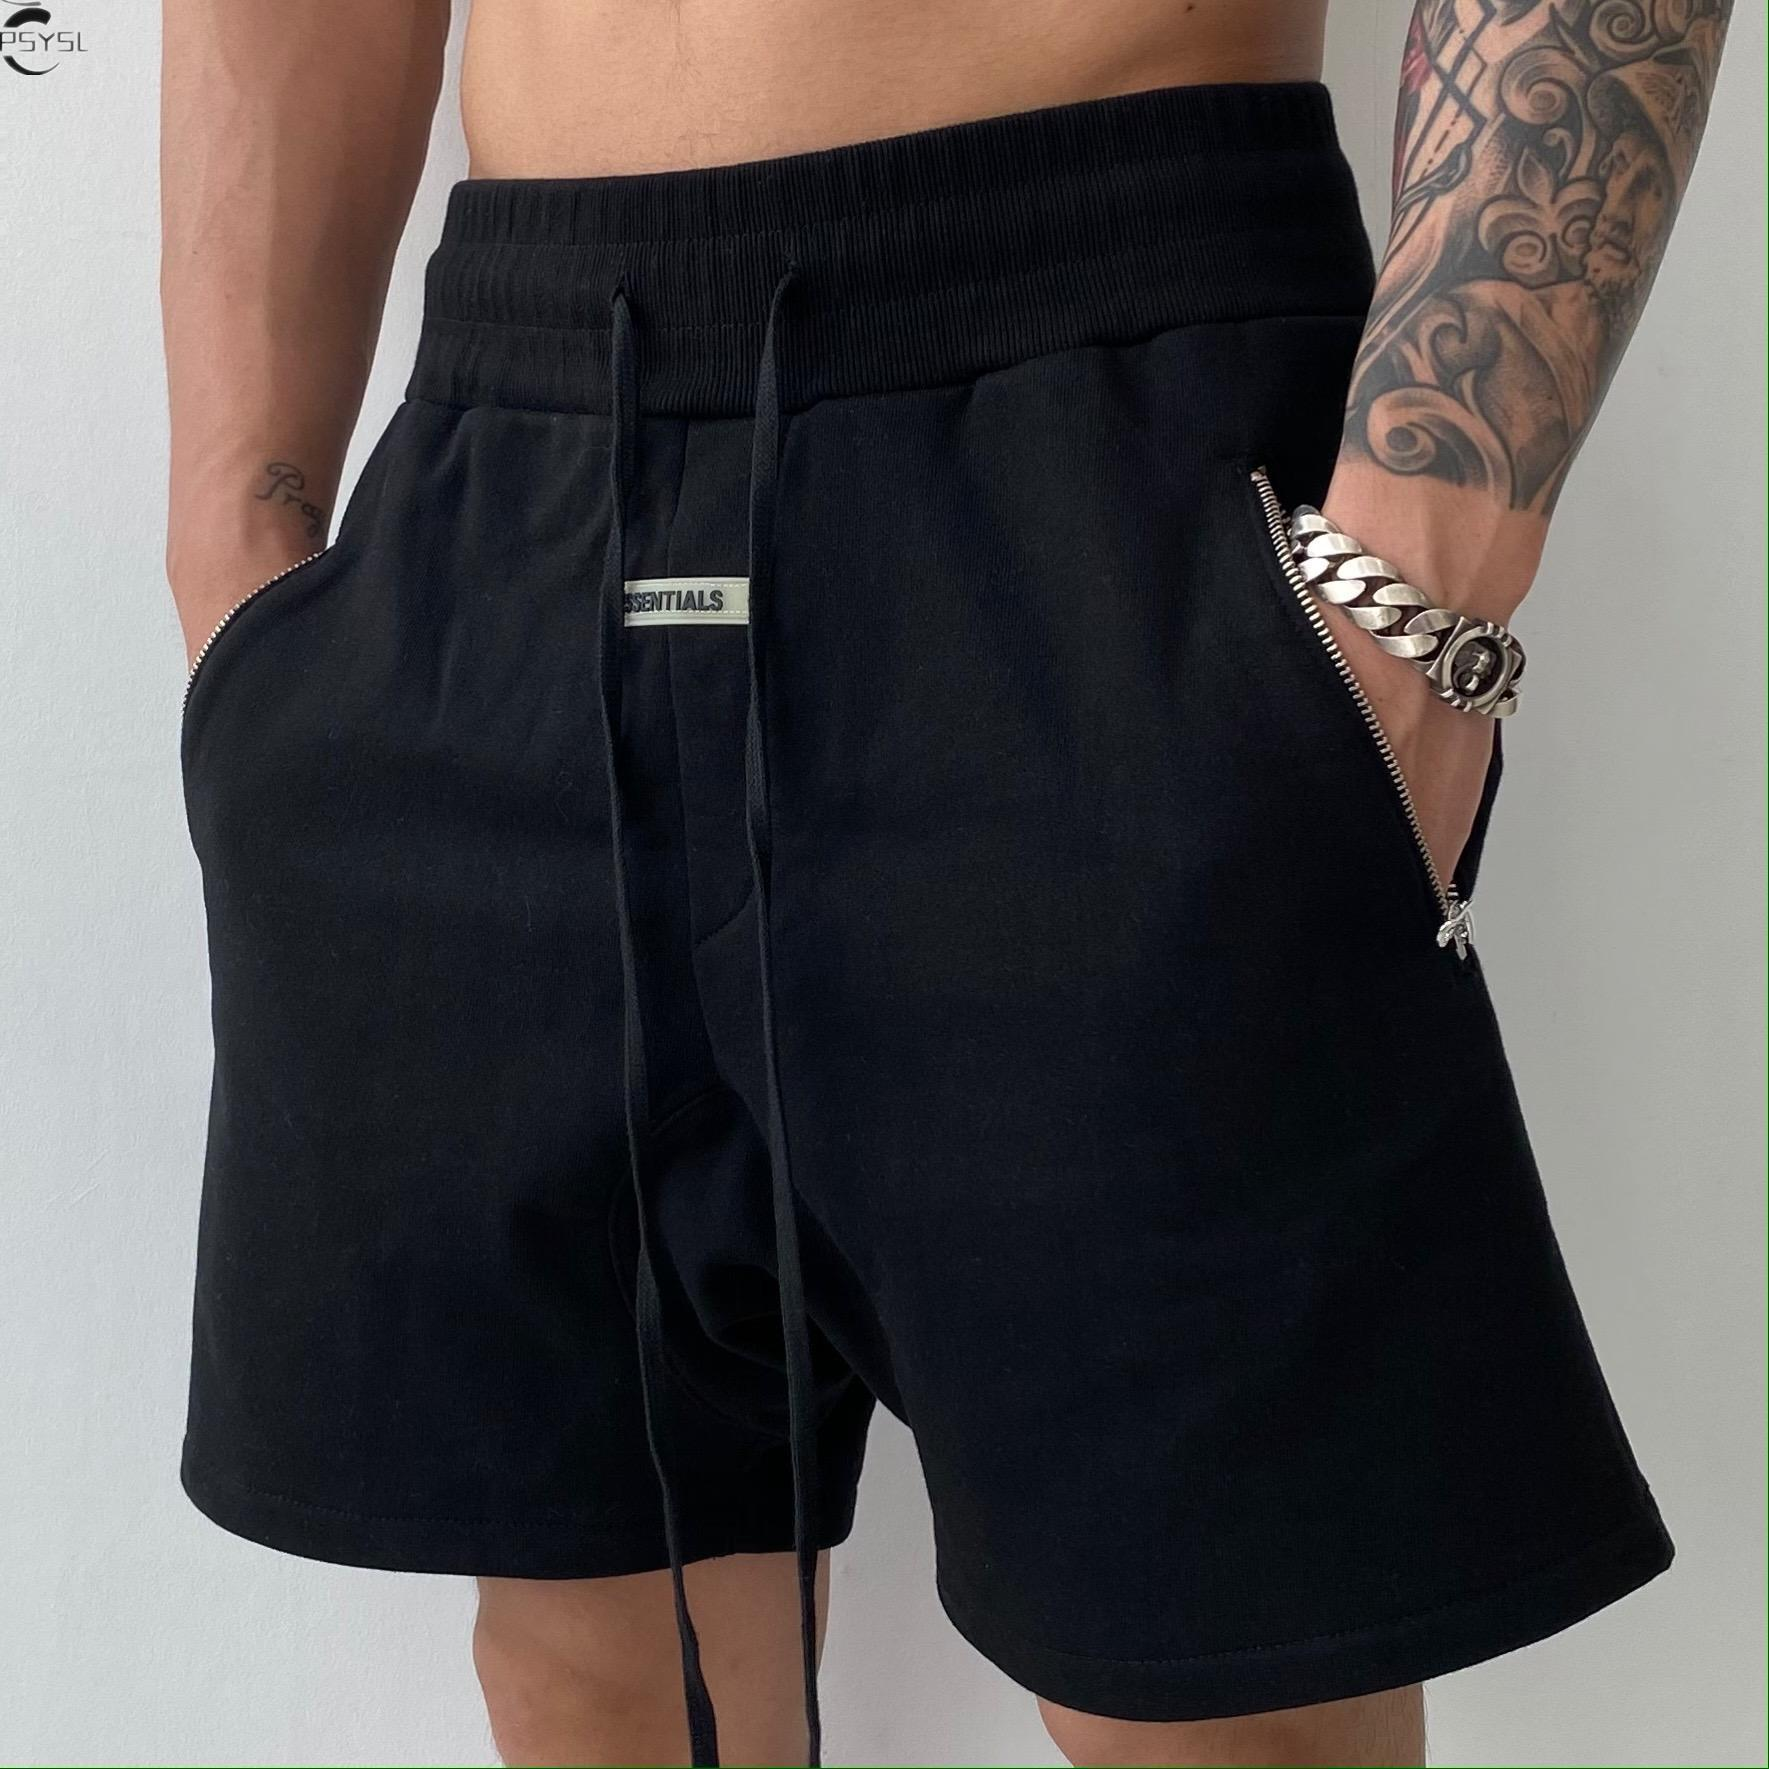 Pure Color New Men's Shorts Summer Brand Clothing Hip Hop Streetwear Male Short Pant Siksilk Casual Silk Silk Men Shorts 2021